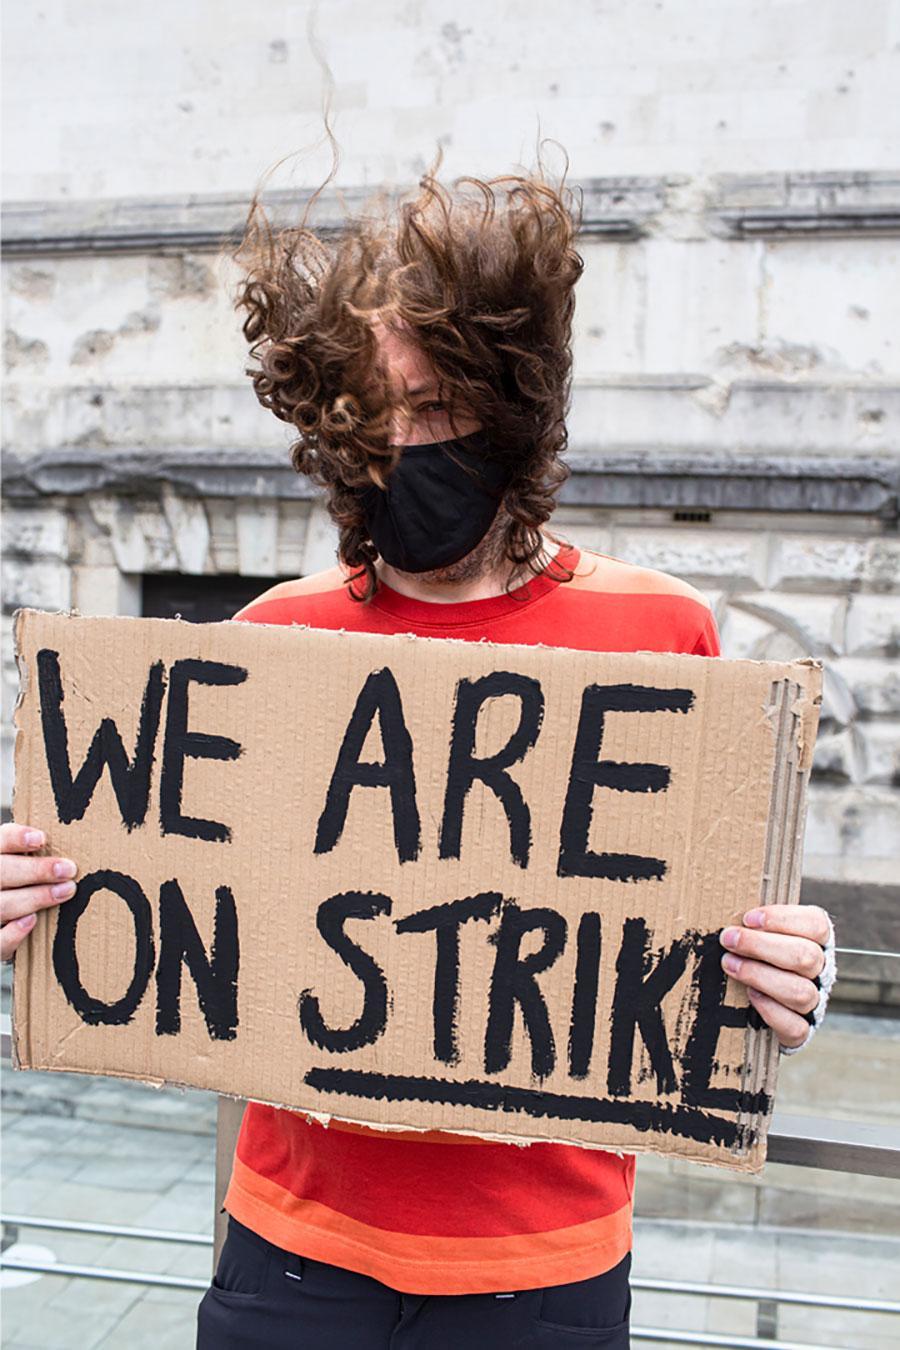 Tate Strike, 2020. Courtesy: Tate United; photograph: Jakub Wijzer